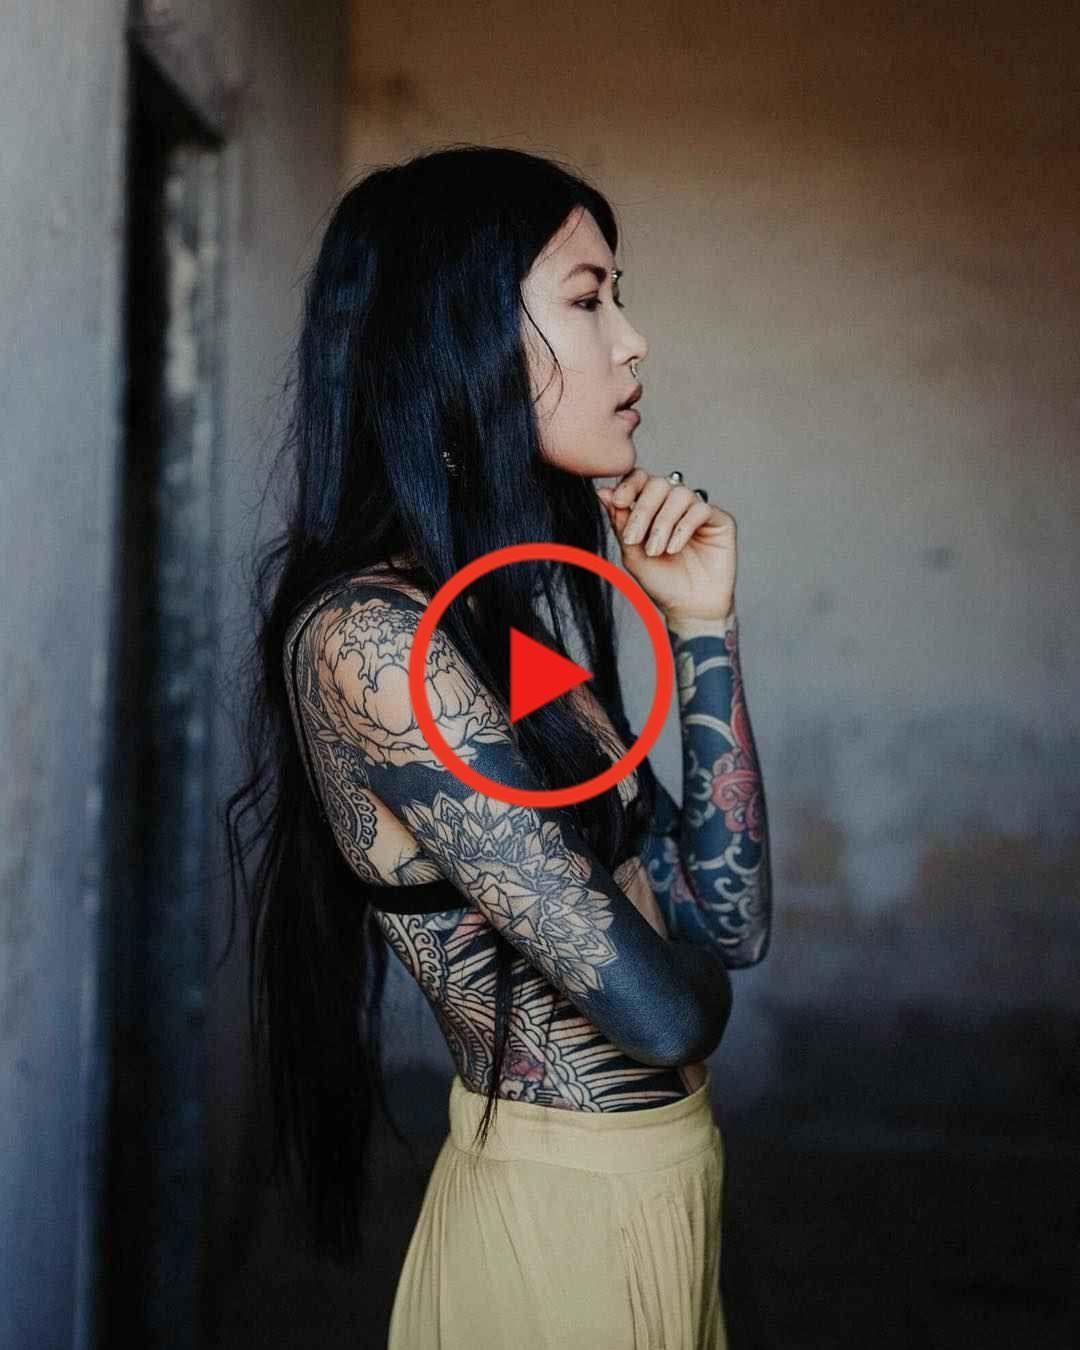 Tattoo model Anh Wisle -  Tattoo model Anh Wisle, alternative photo model, tattooed girl | France #tattooideas #besttattooide - #Anh #liontattoo #model #tattoo #tattoogirlmodels #wisle